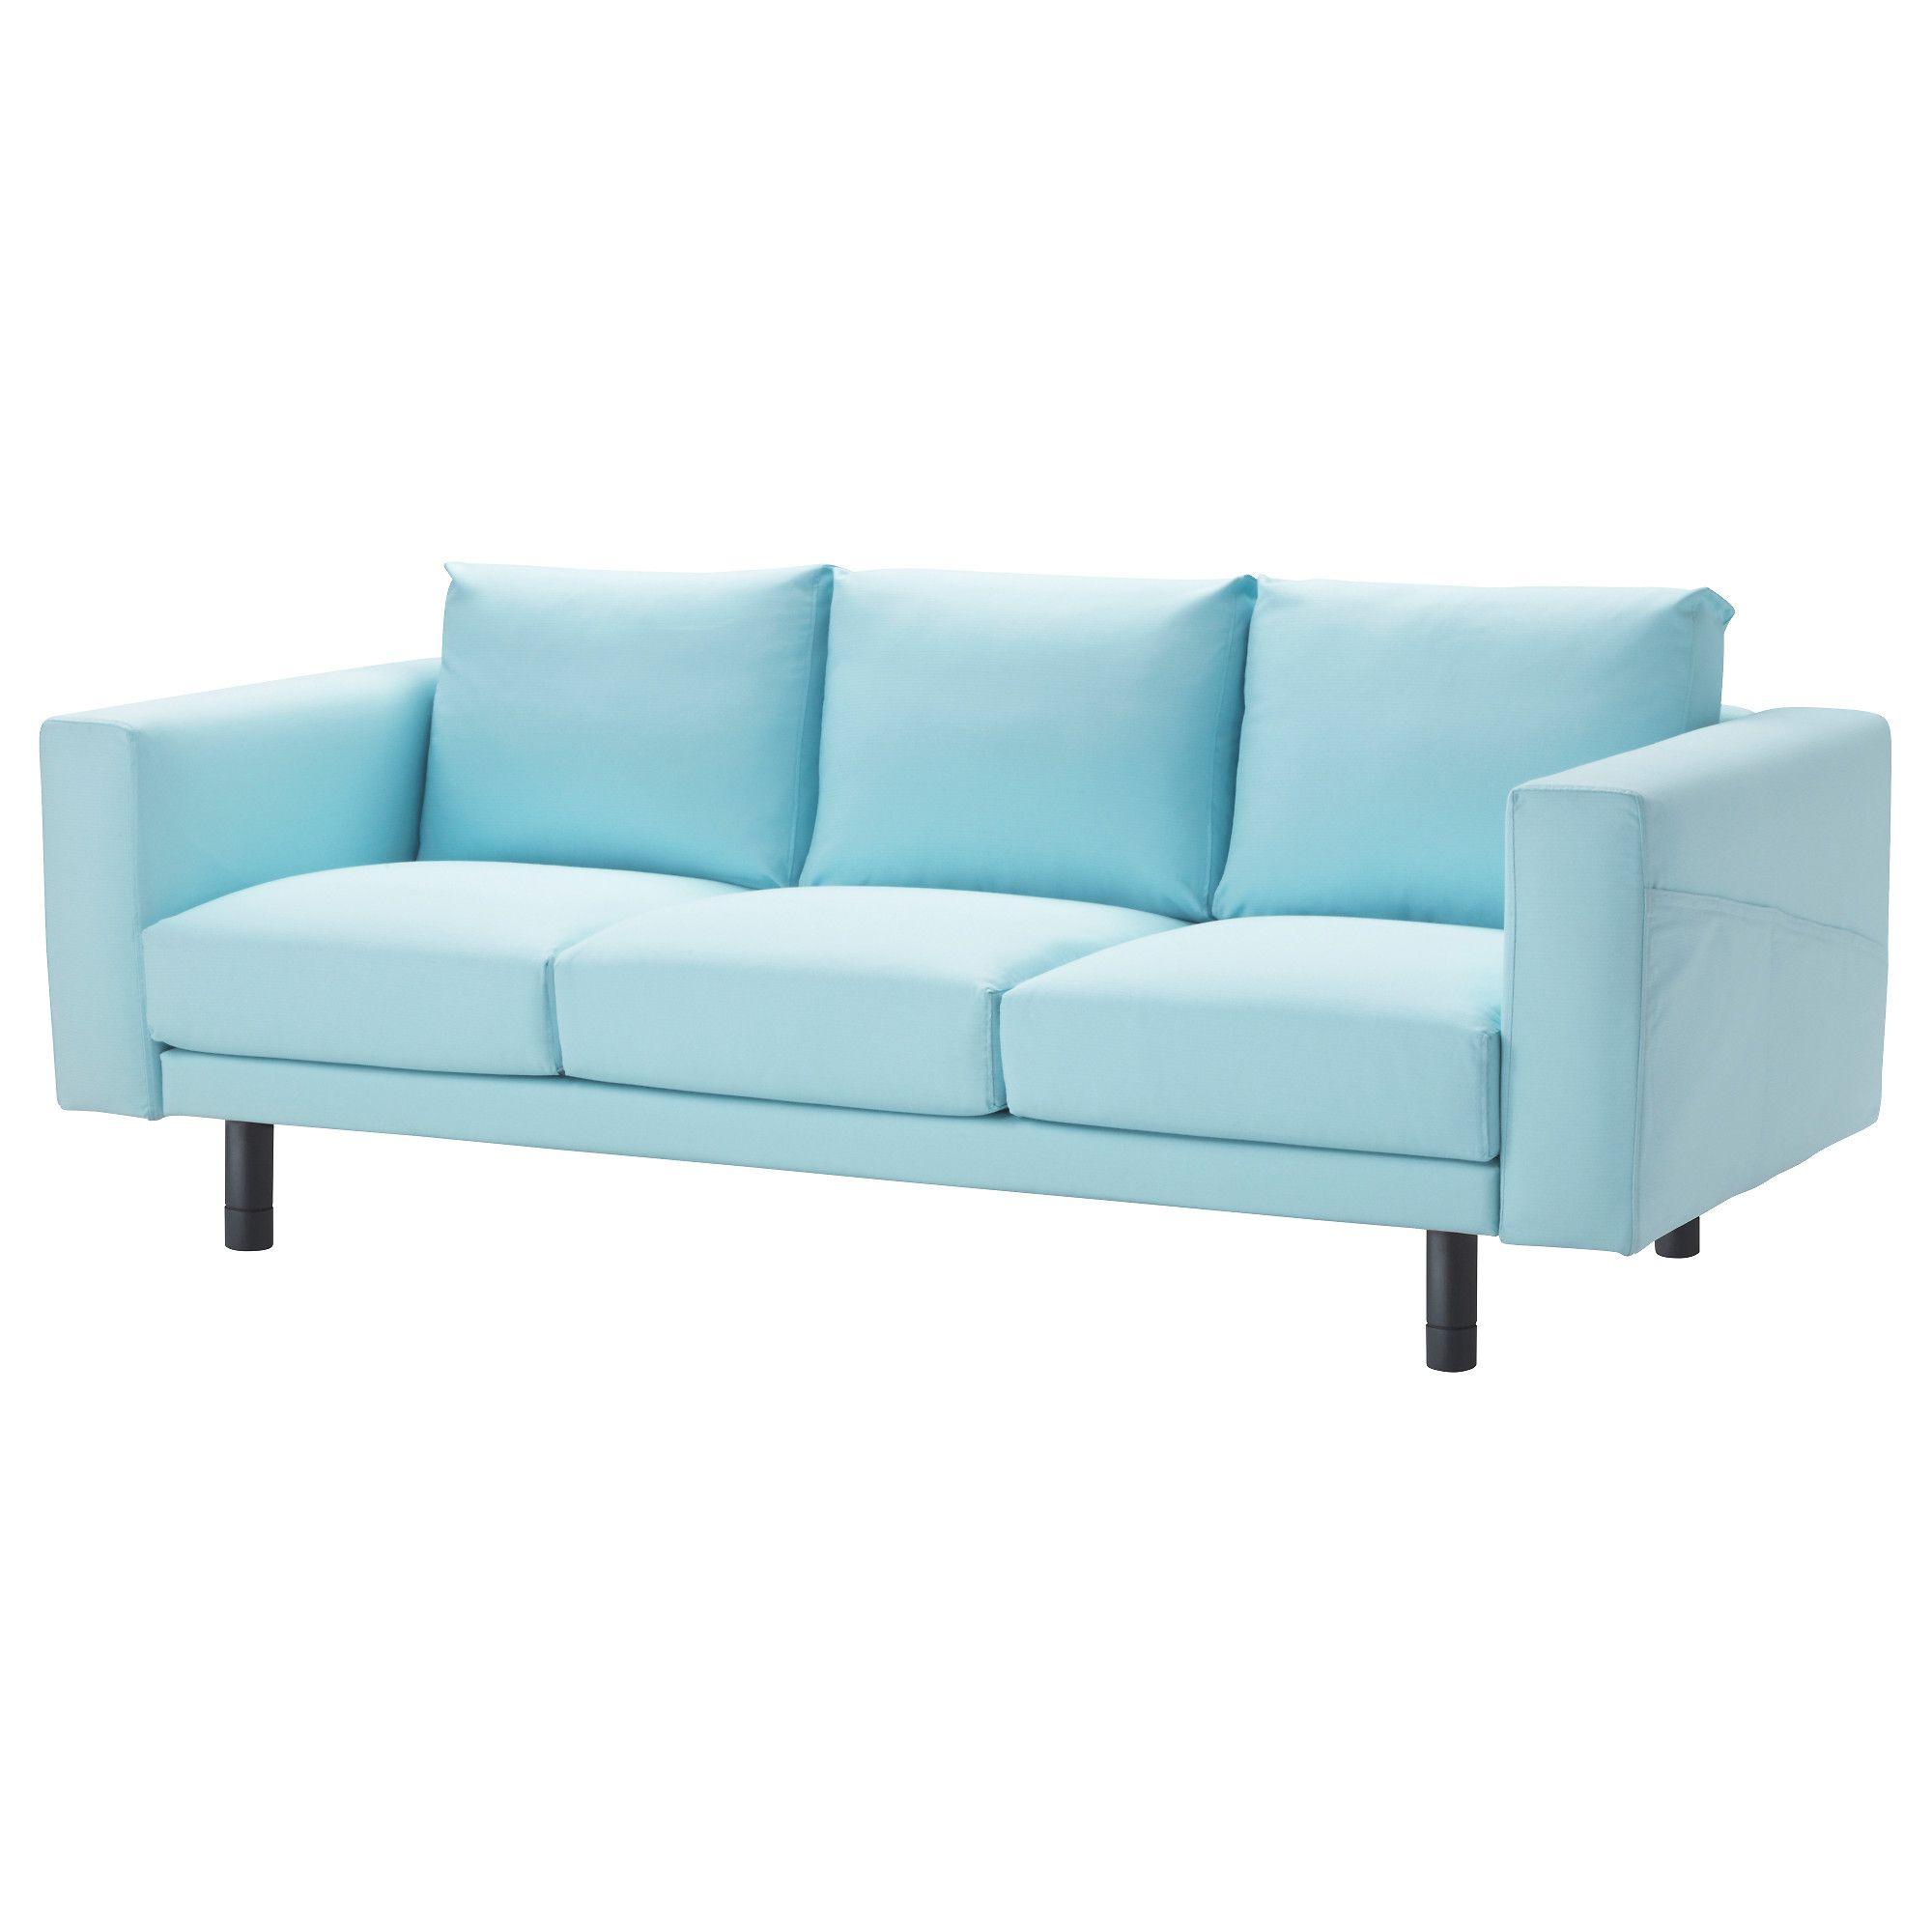 ikea - norsborg, sofa, edum dark blue, gray, , big or small